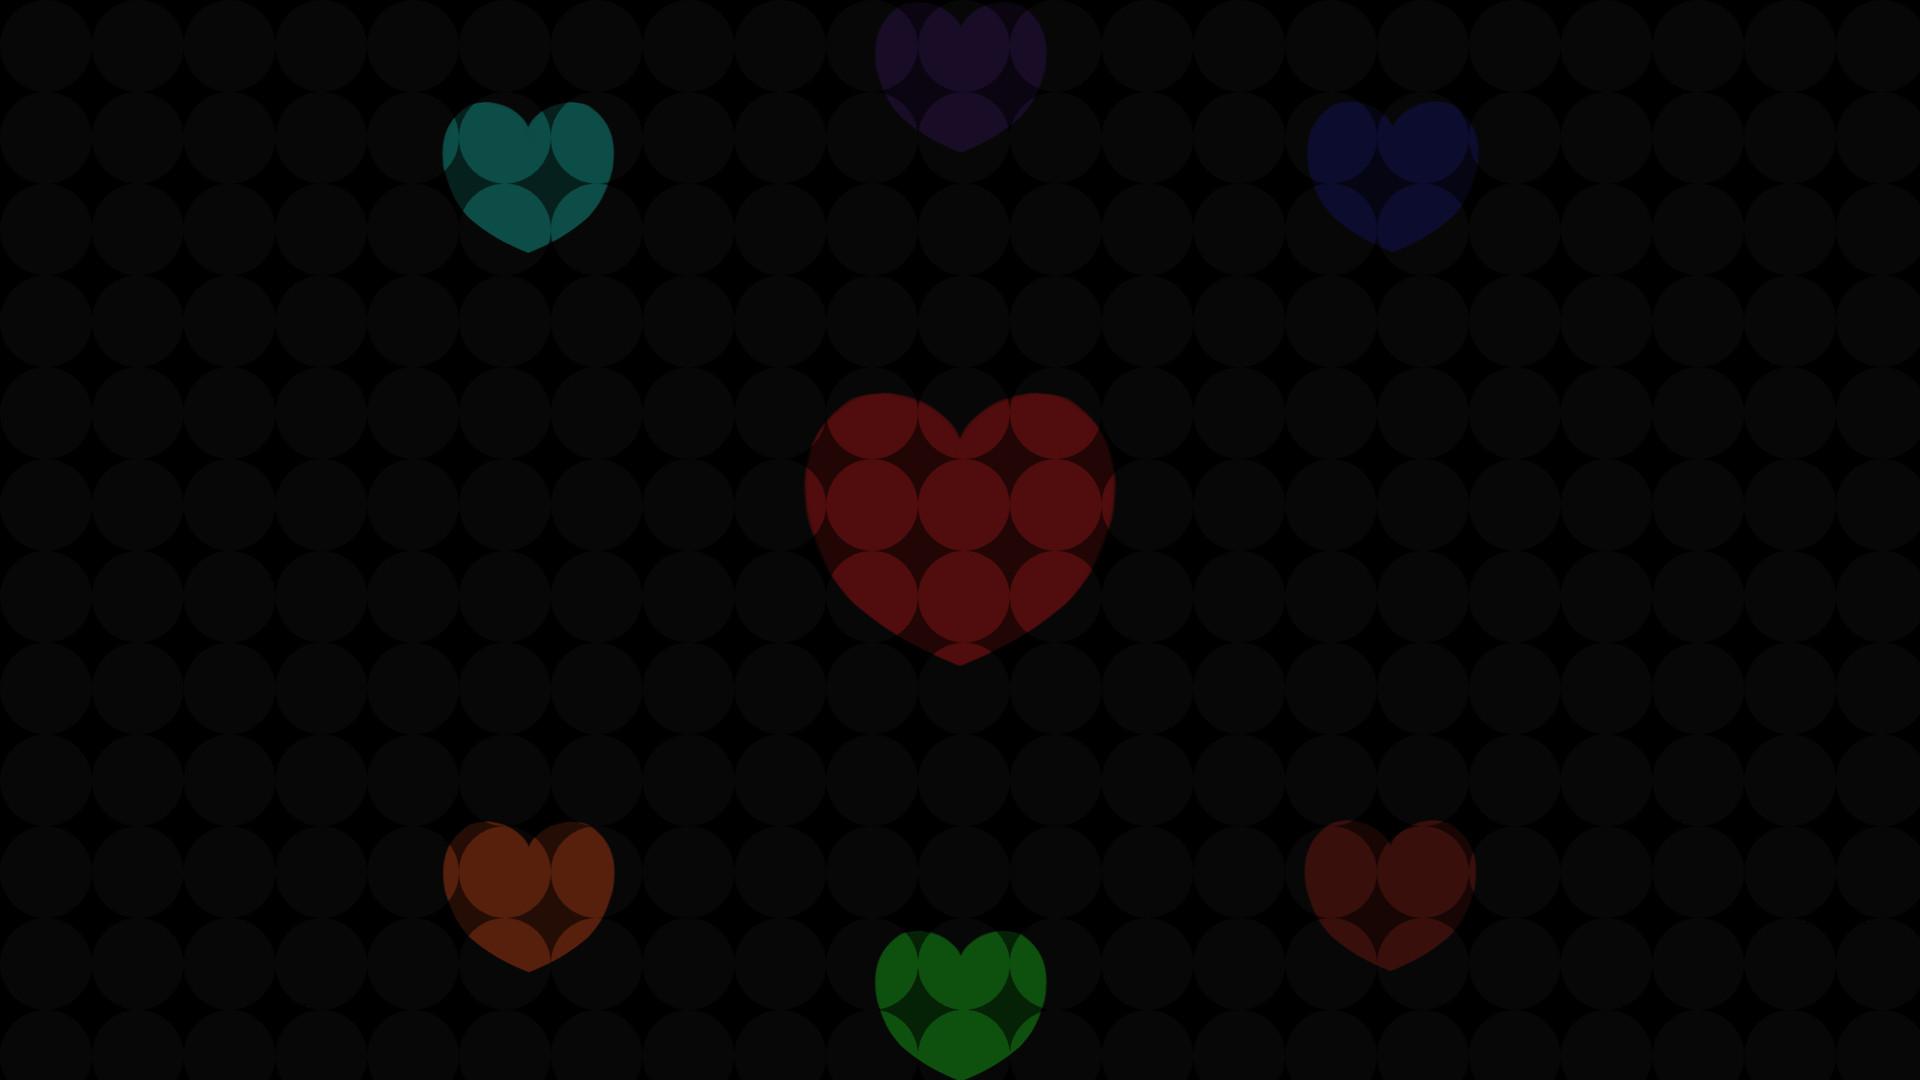 Undertale Wallpaper by SomeWeirdCat Undertale Wallpaper by SomeWeirdCat